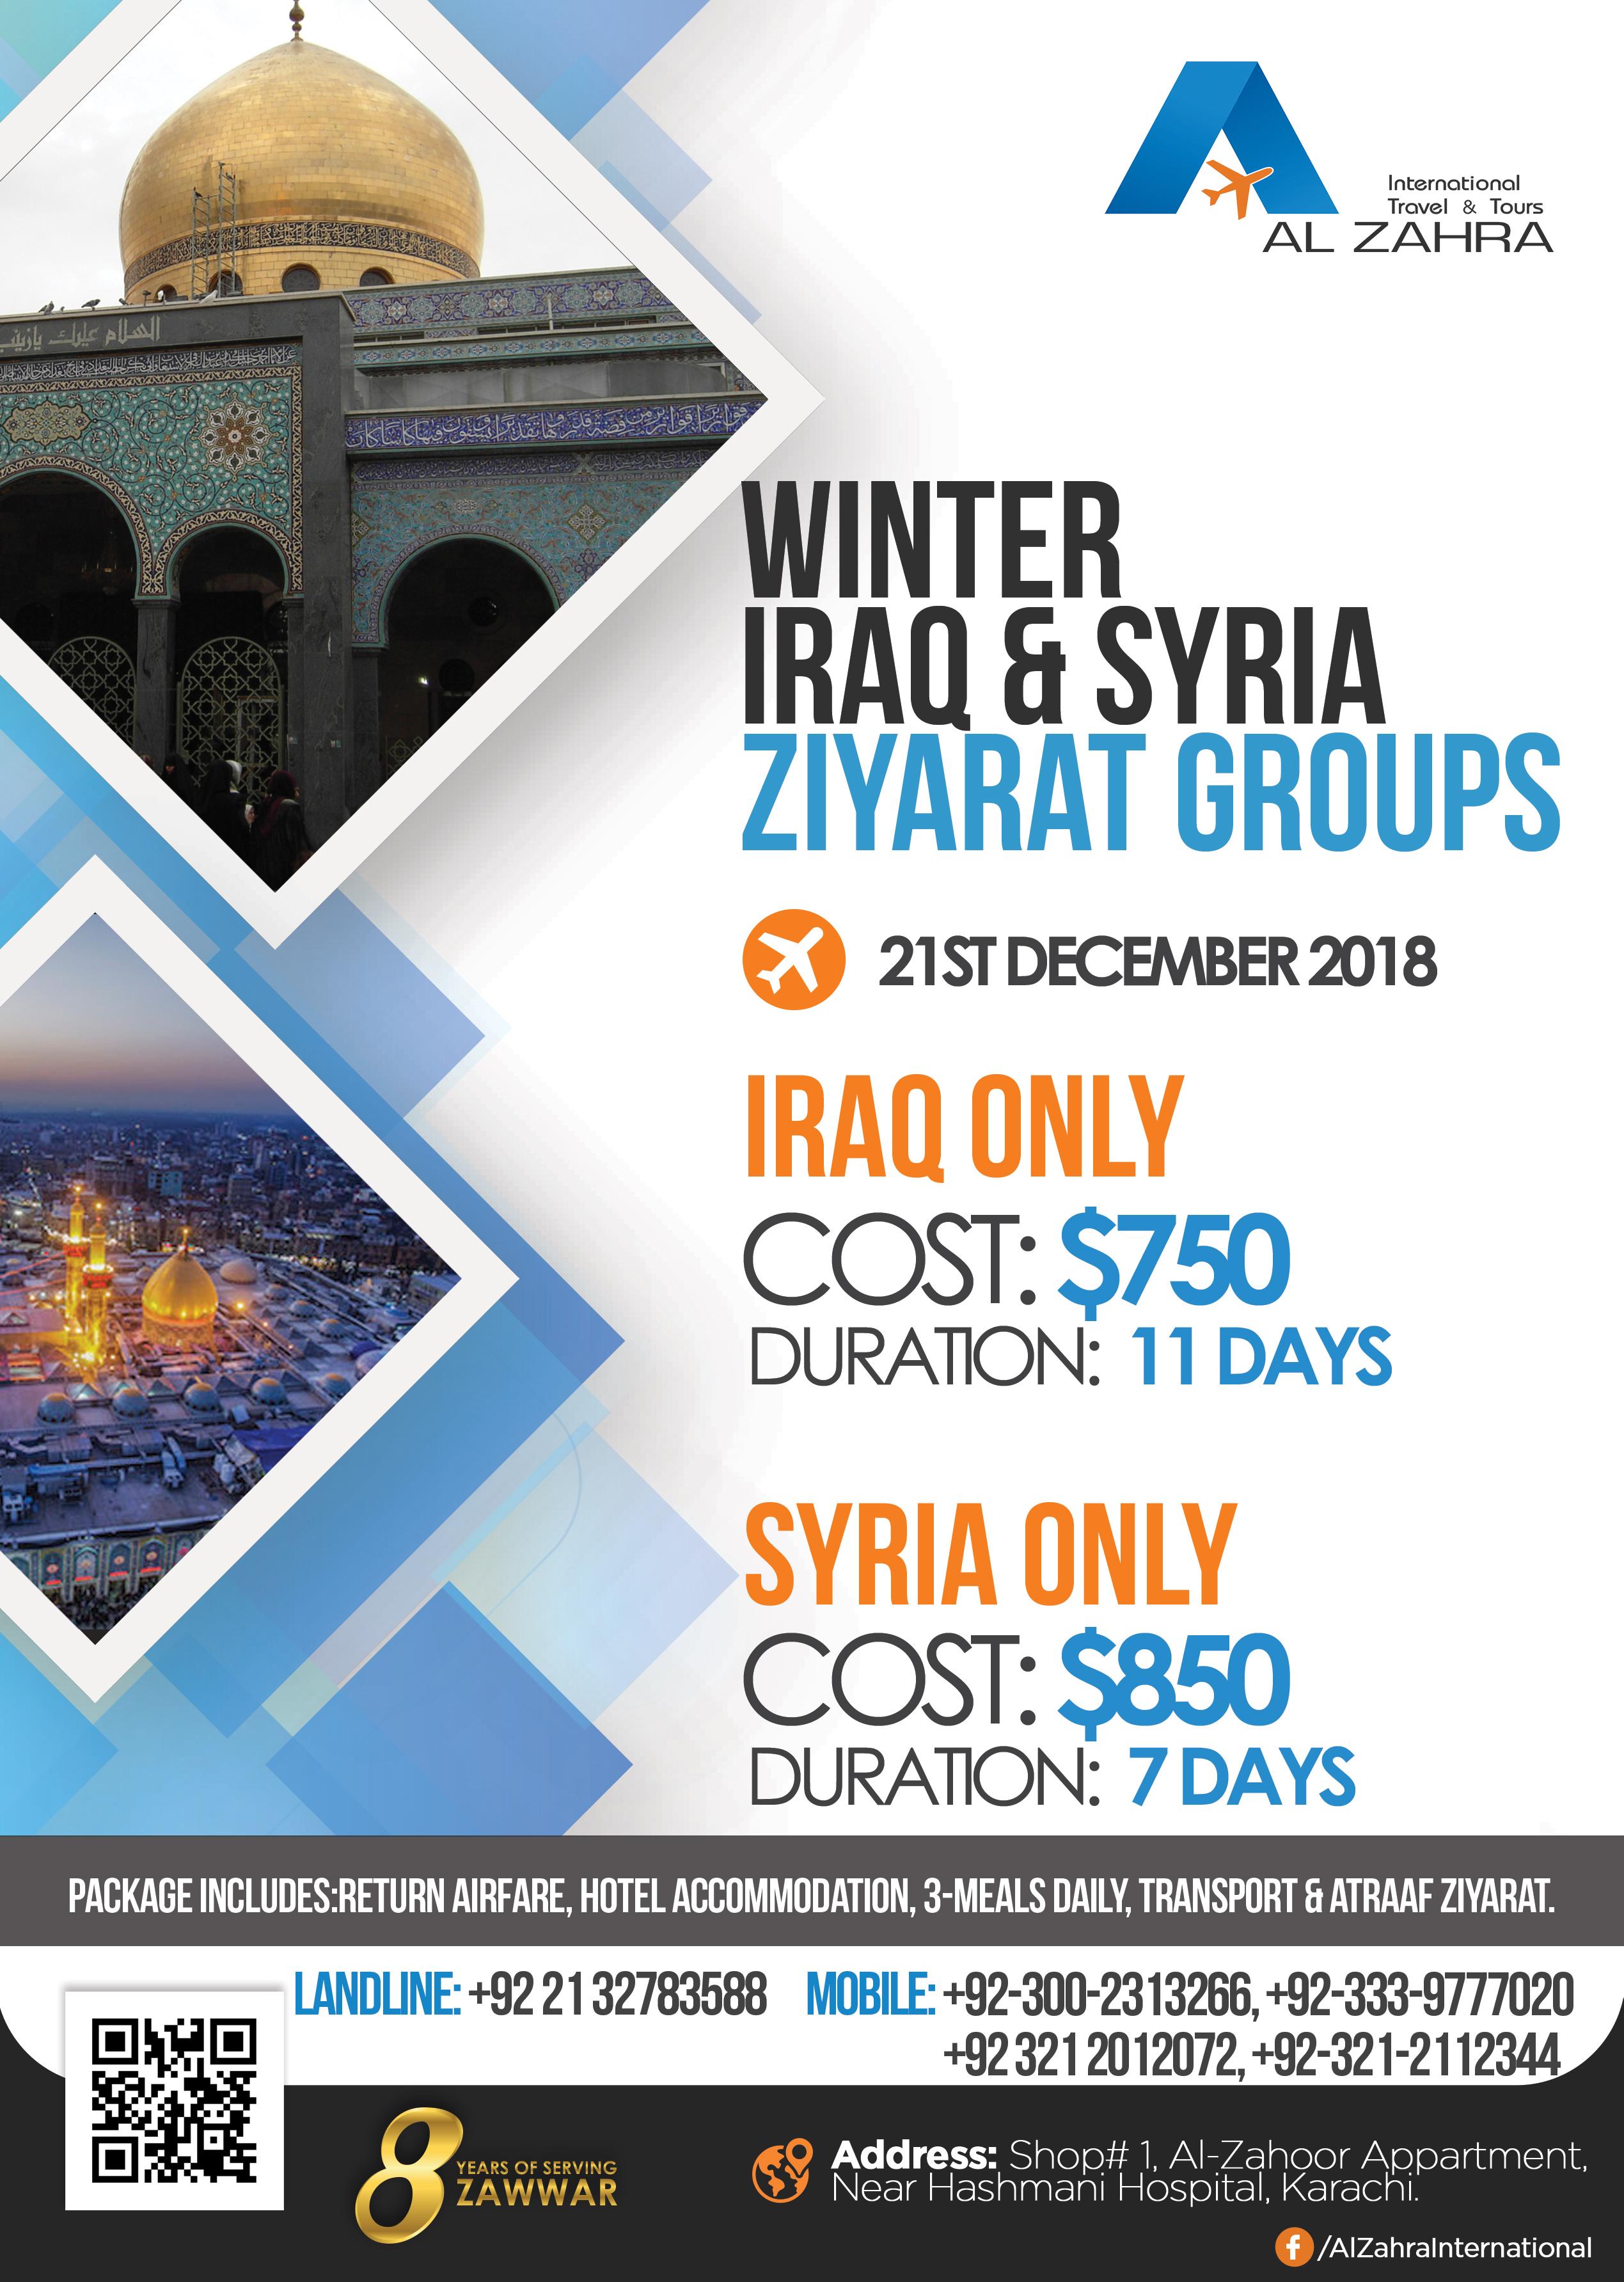 Winter Iraq Syria Ziyarat Groups Handbill Al Zahra Travel Tours